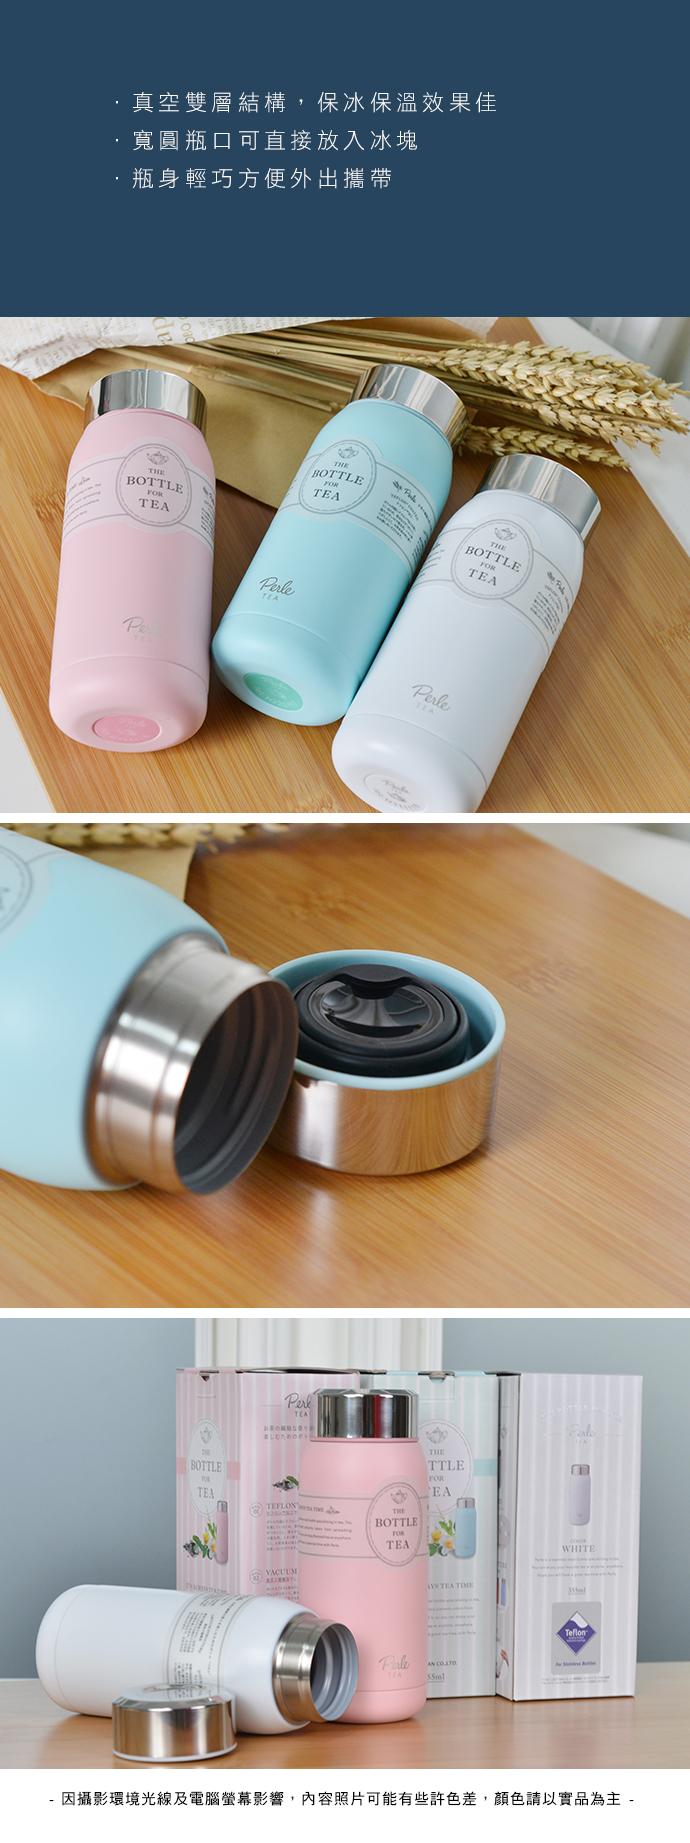 CB Japan Perle 粉色佳人雙層保冷保溫杯 - 天空藍